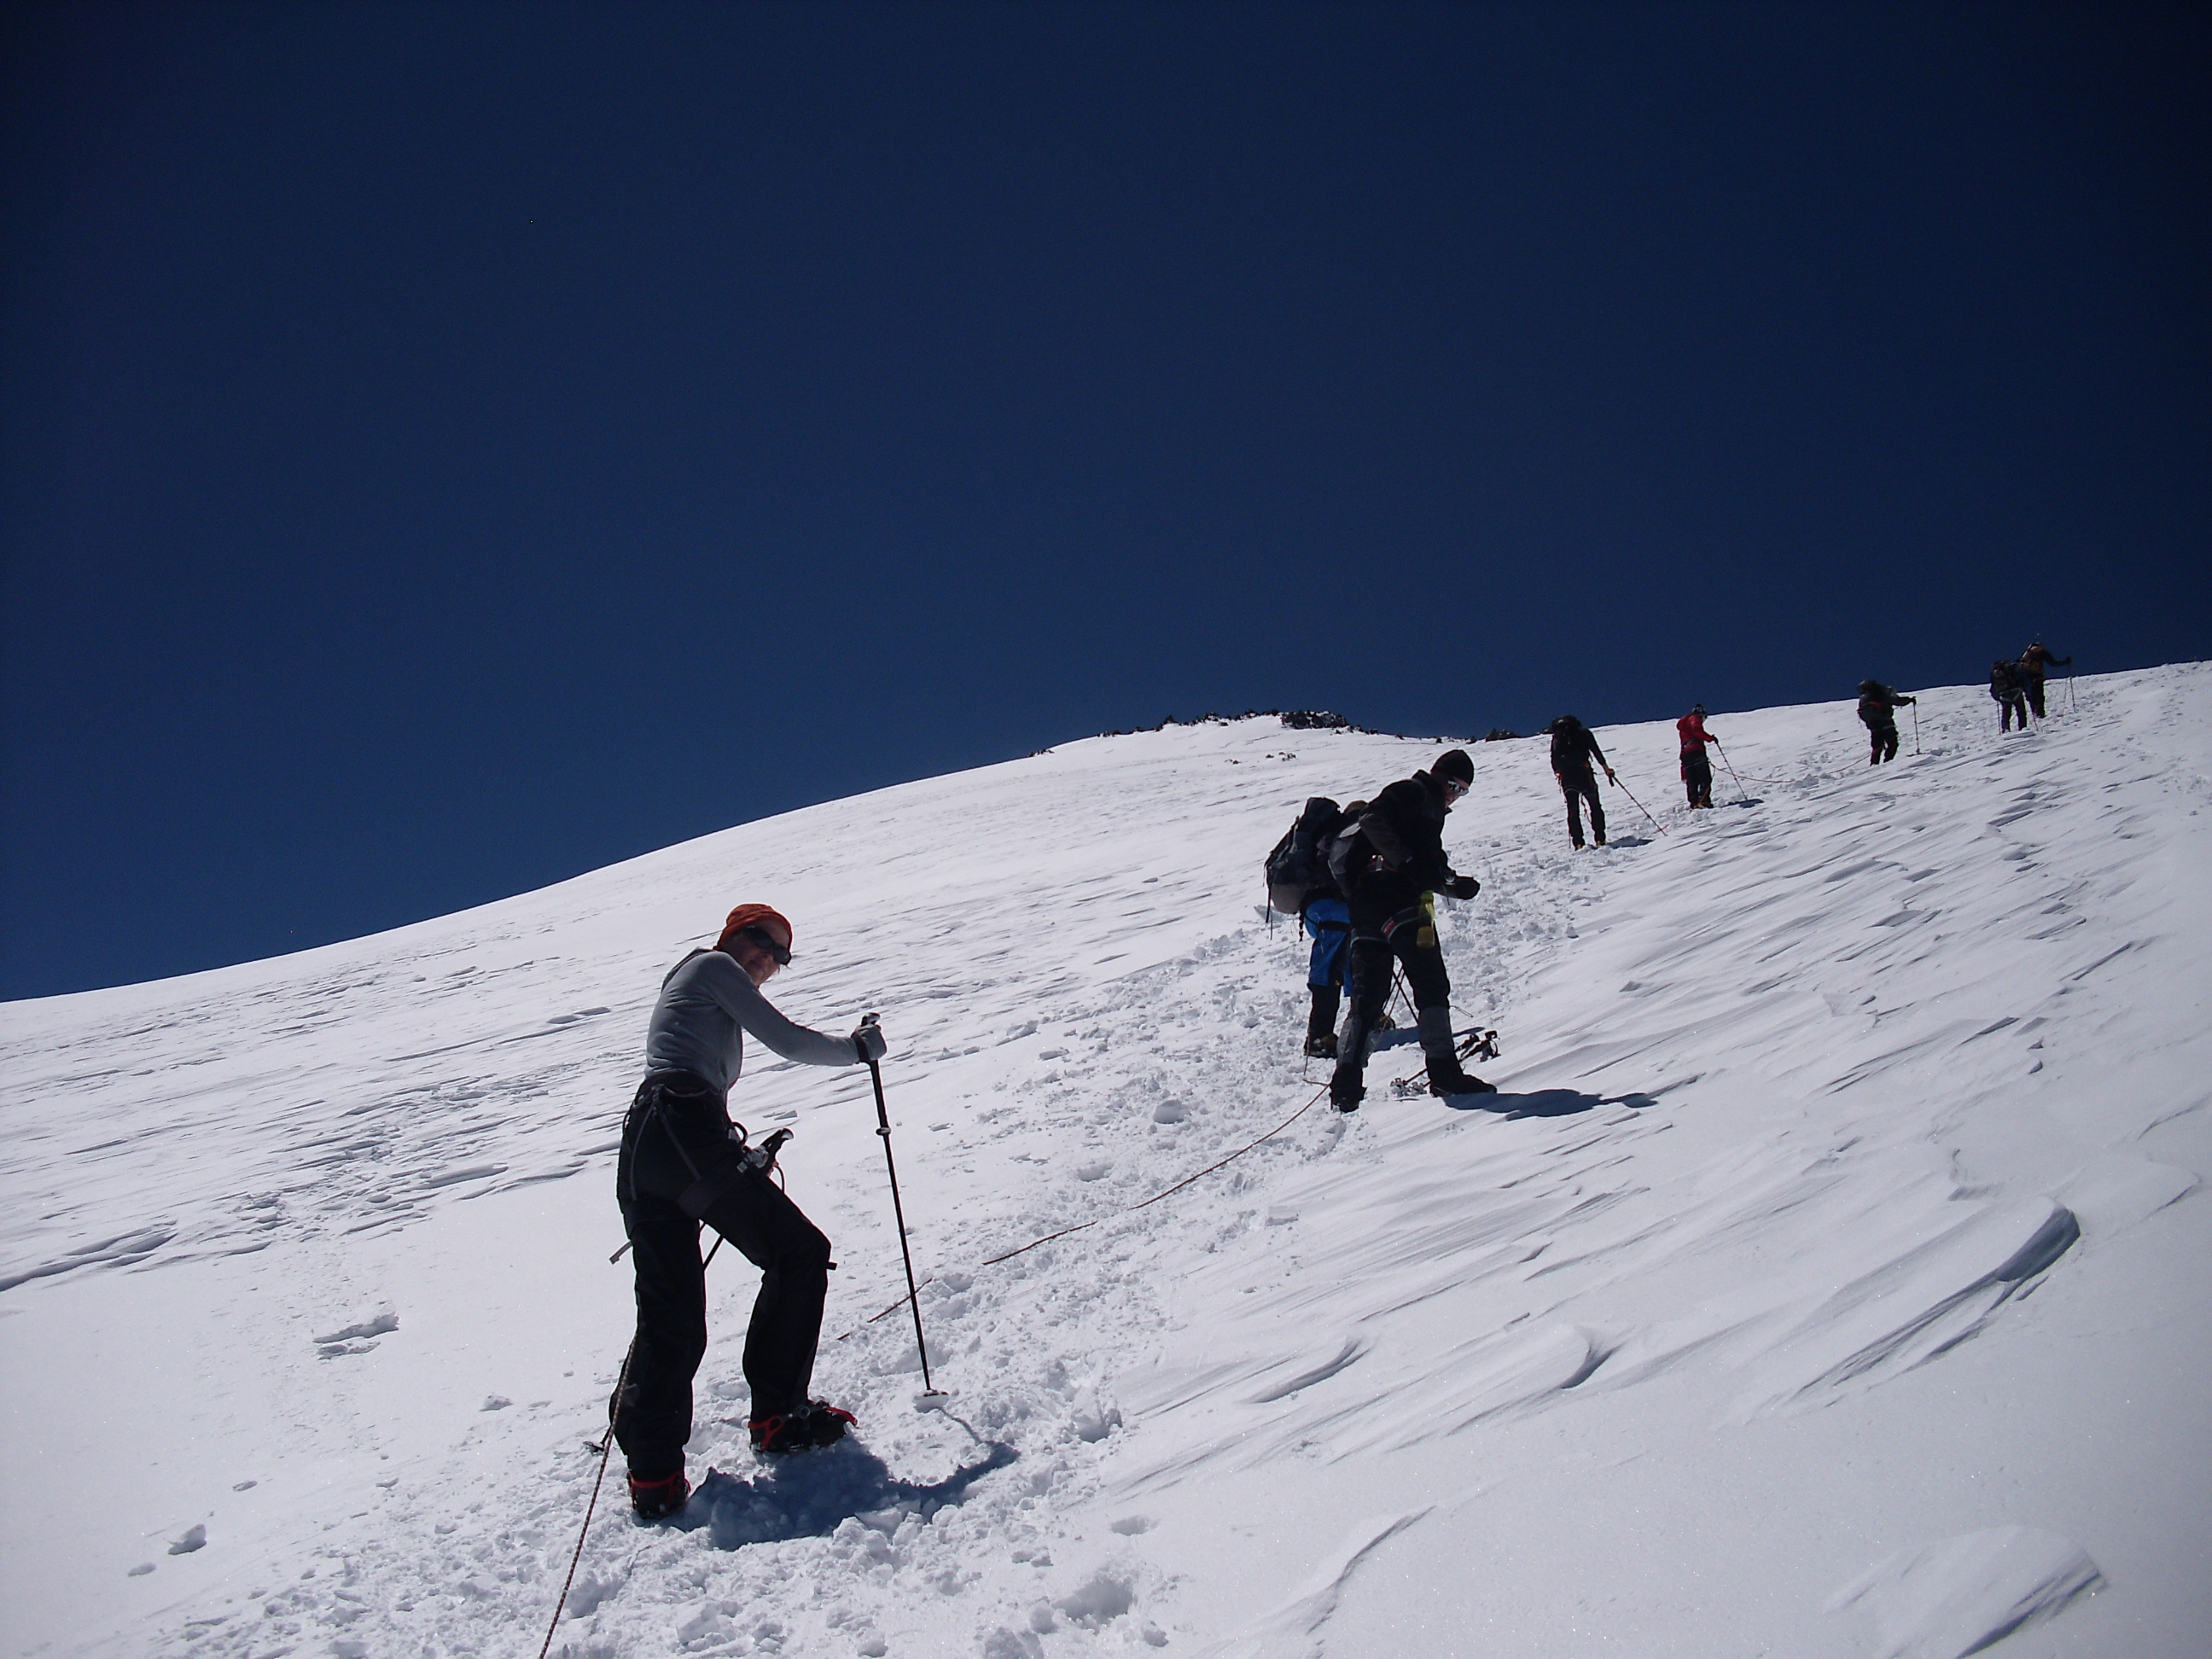 image4gisa hoppe mit trekking